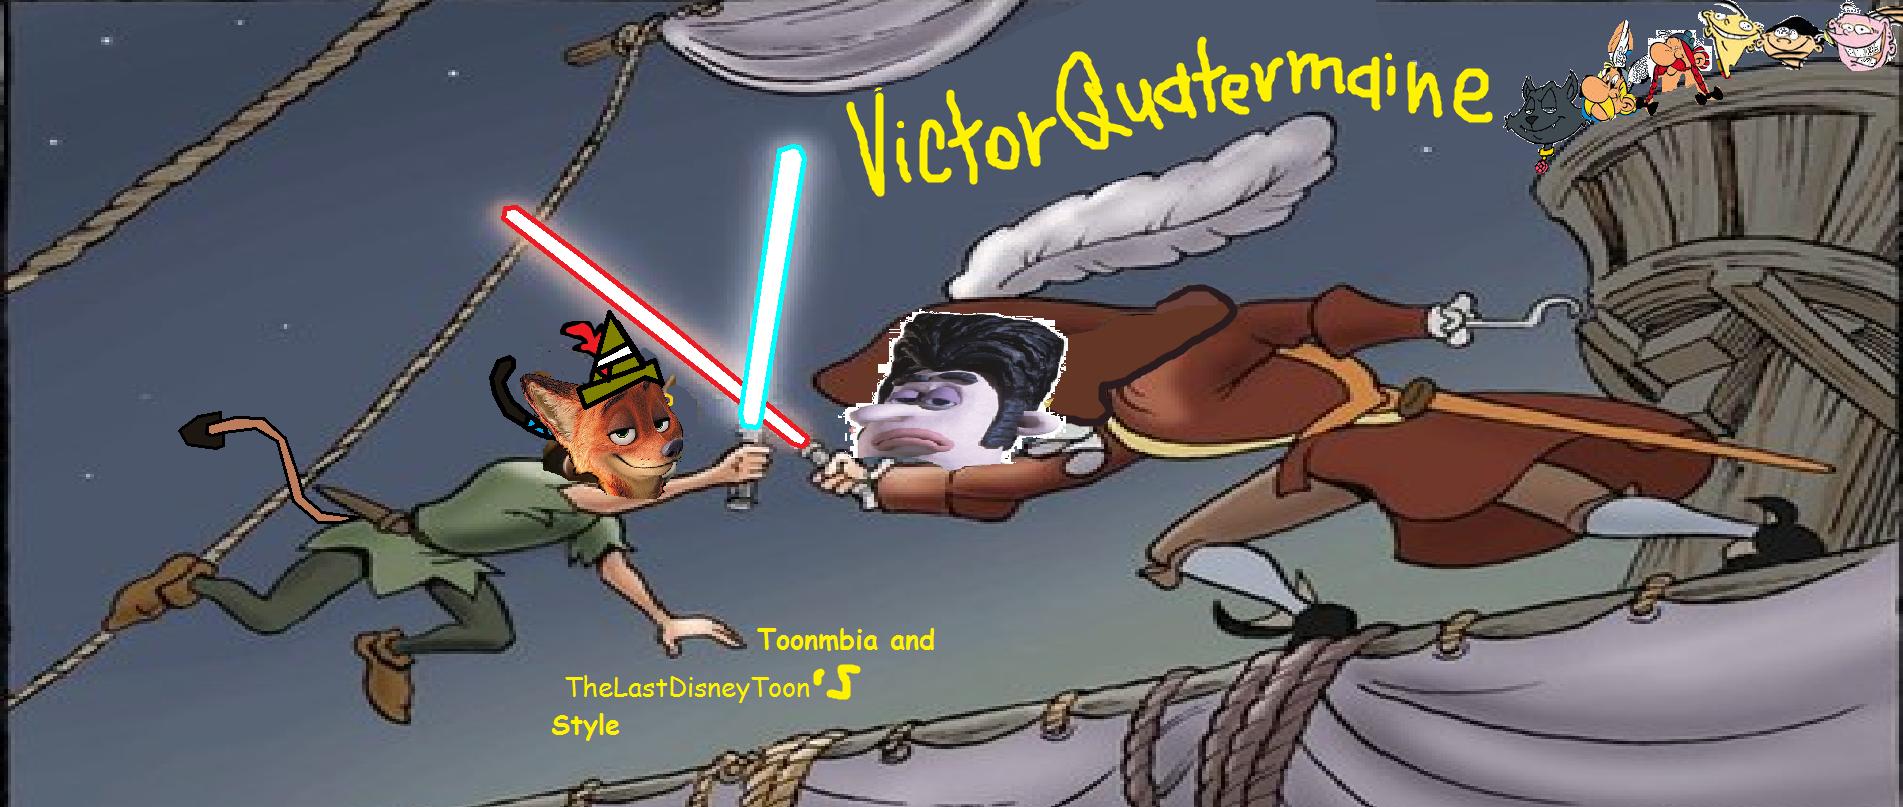 Victor Quartermaine (Hook)